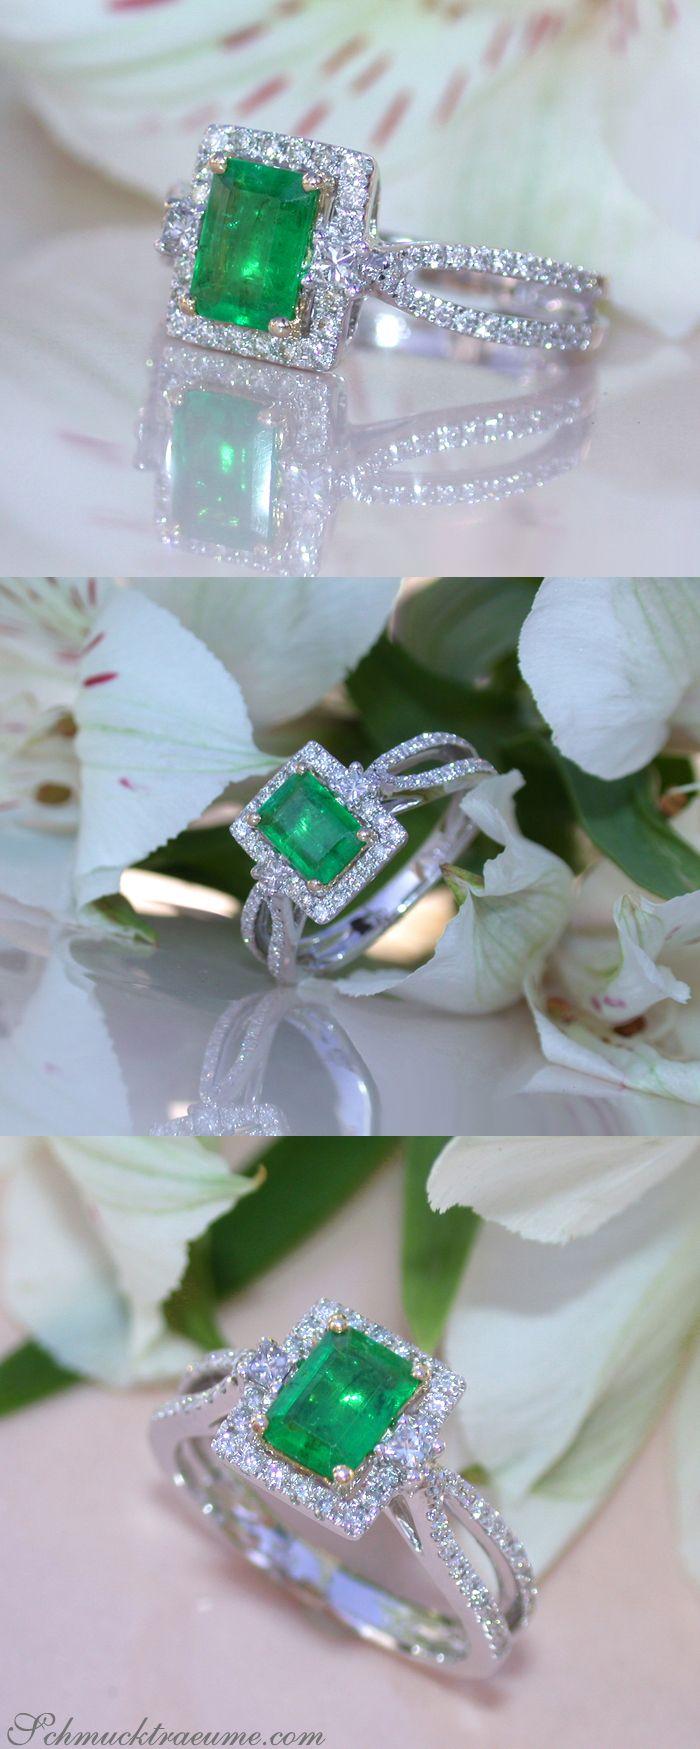 Beautiful Emerald Ring with Diamonds in Whitegold 18k | Feinster Smaragd Ring mit Brillanten in Weißgold 750 | Visit: schmucktraeume.com Like: https://www.facebook.com/Noble-Juwelen-150871984924926/